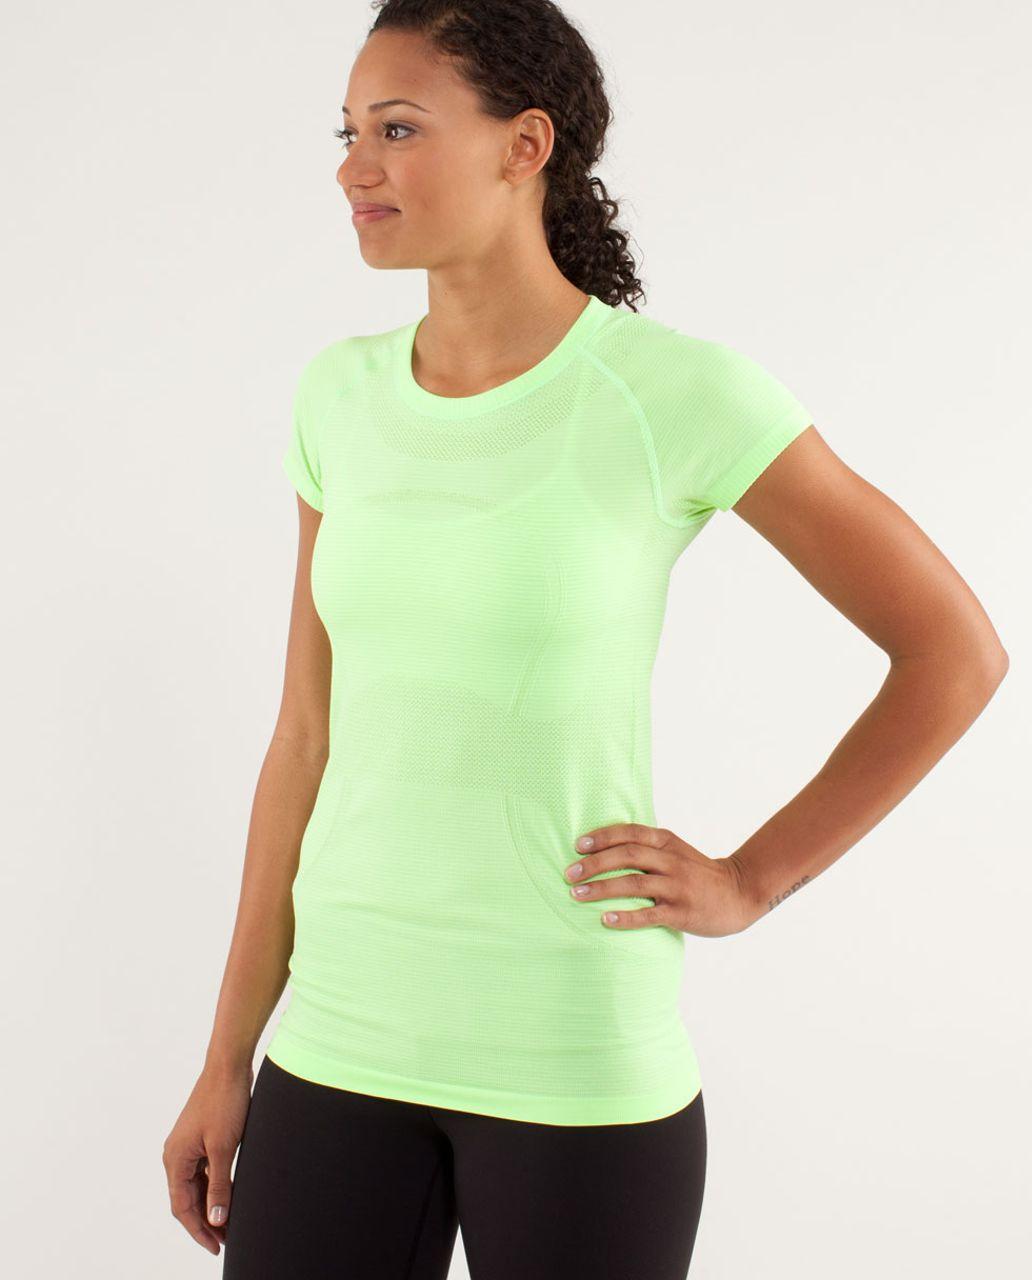 Lululemon Run:  Swiftly Tech Short Sleeve - Zippy Green